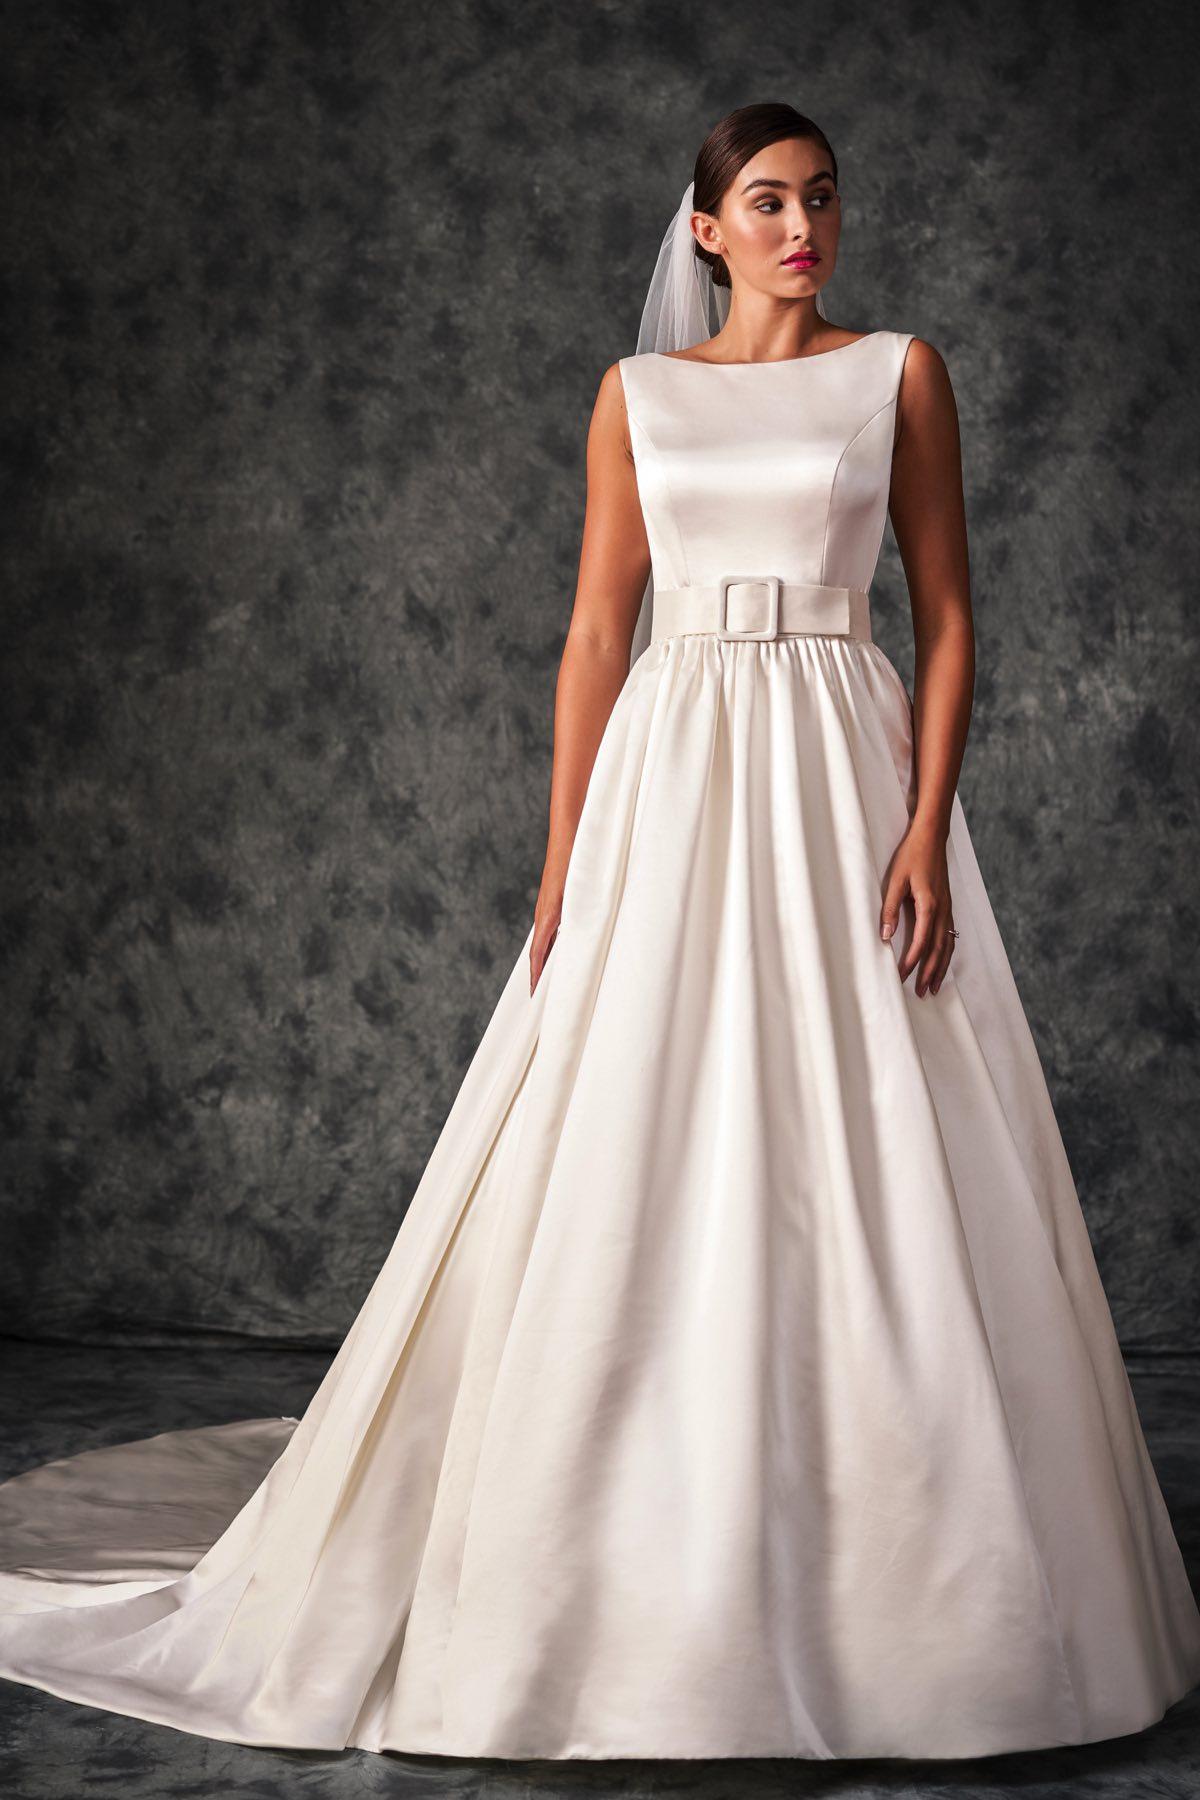 A229010 Silk Satin Sabrina Neckline Ball Gown With Deep Back